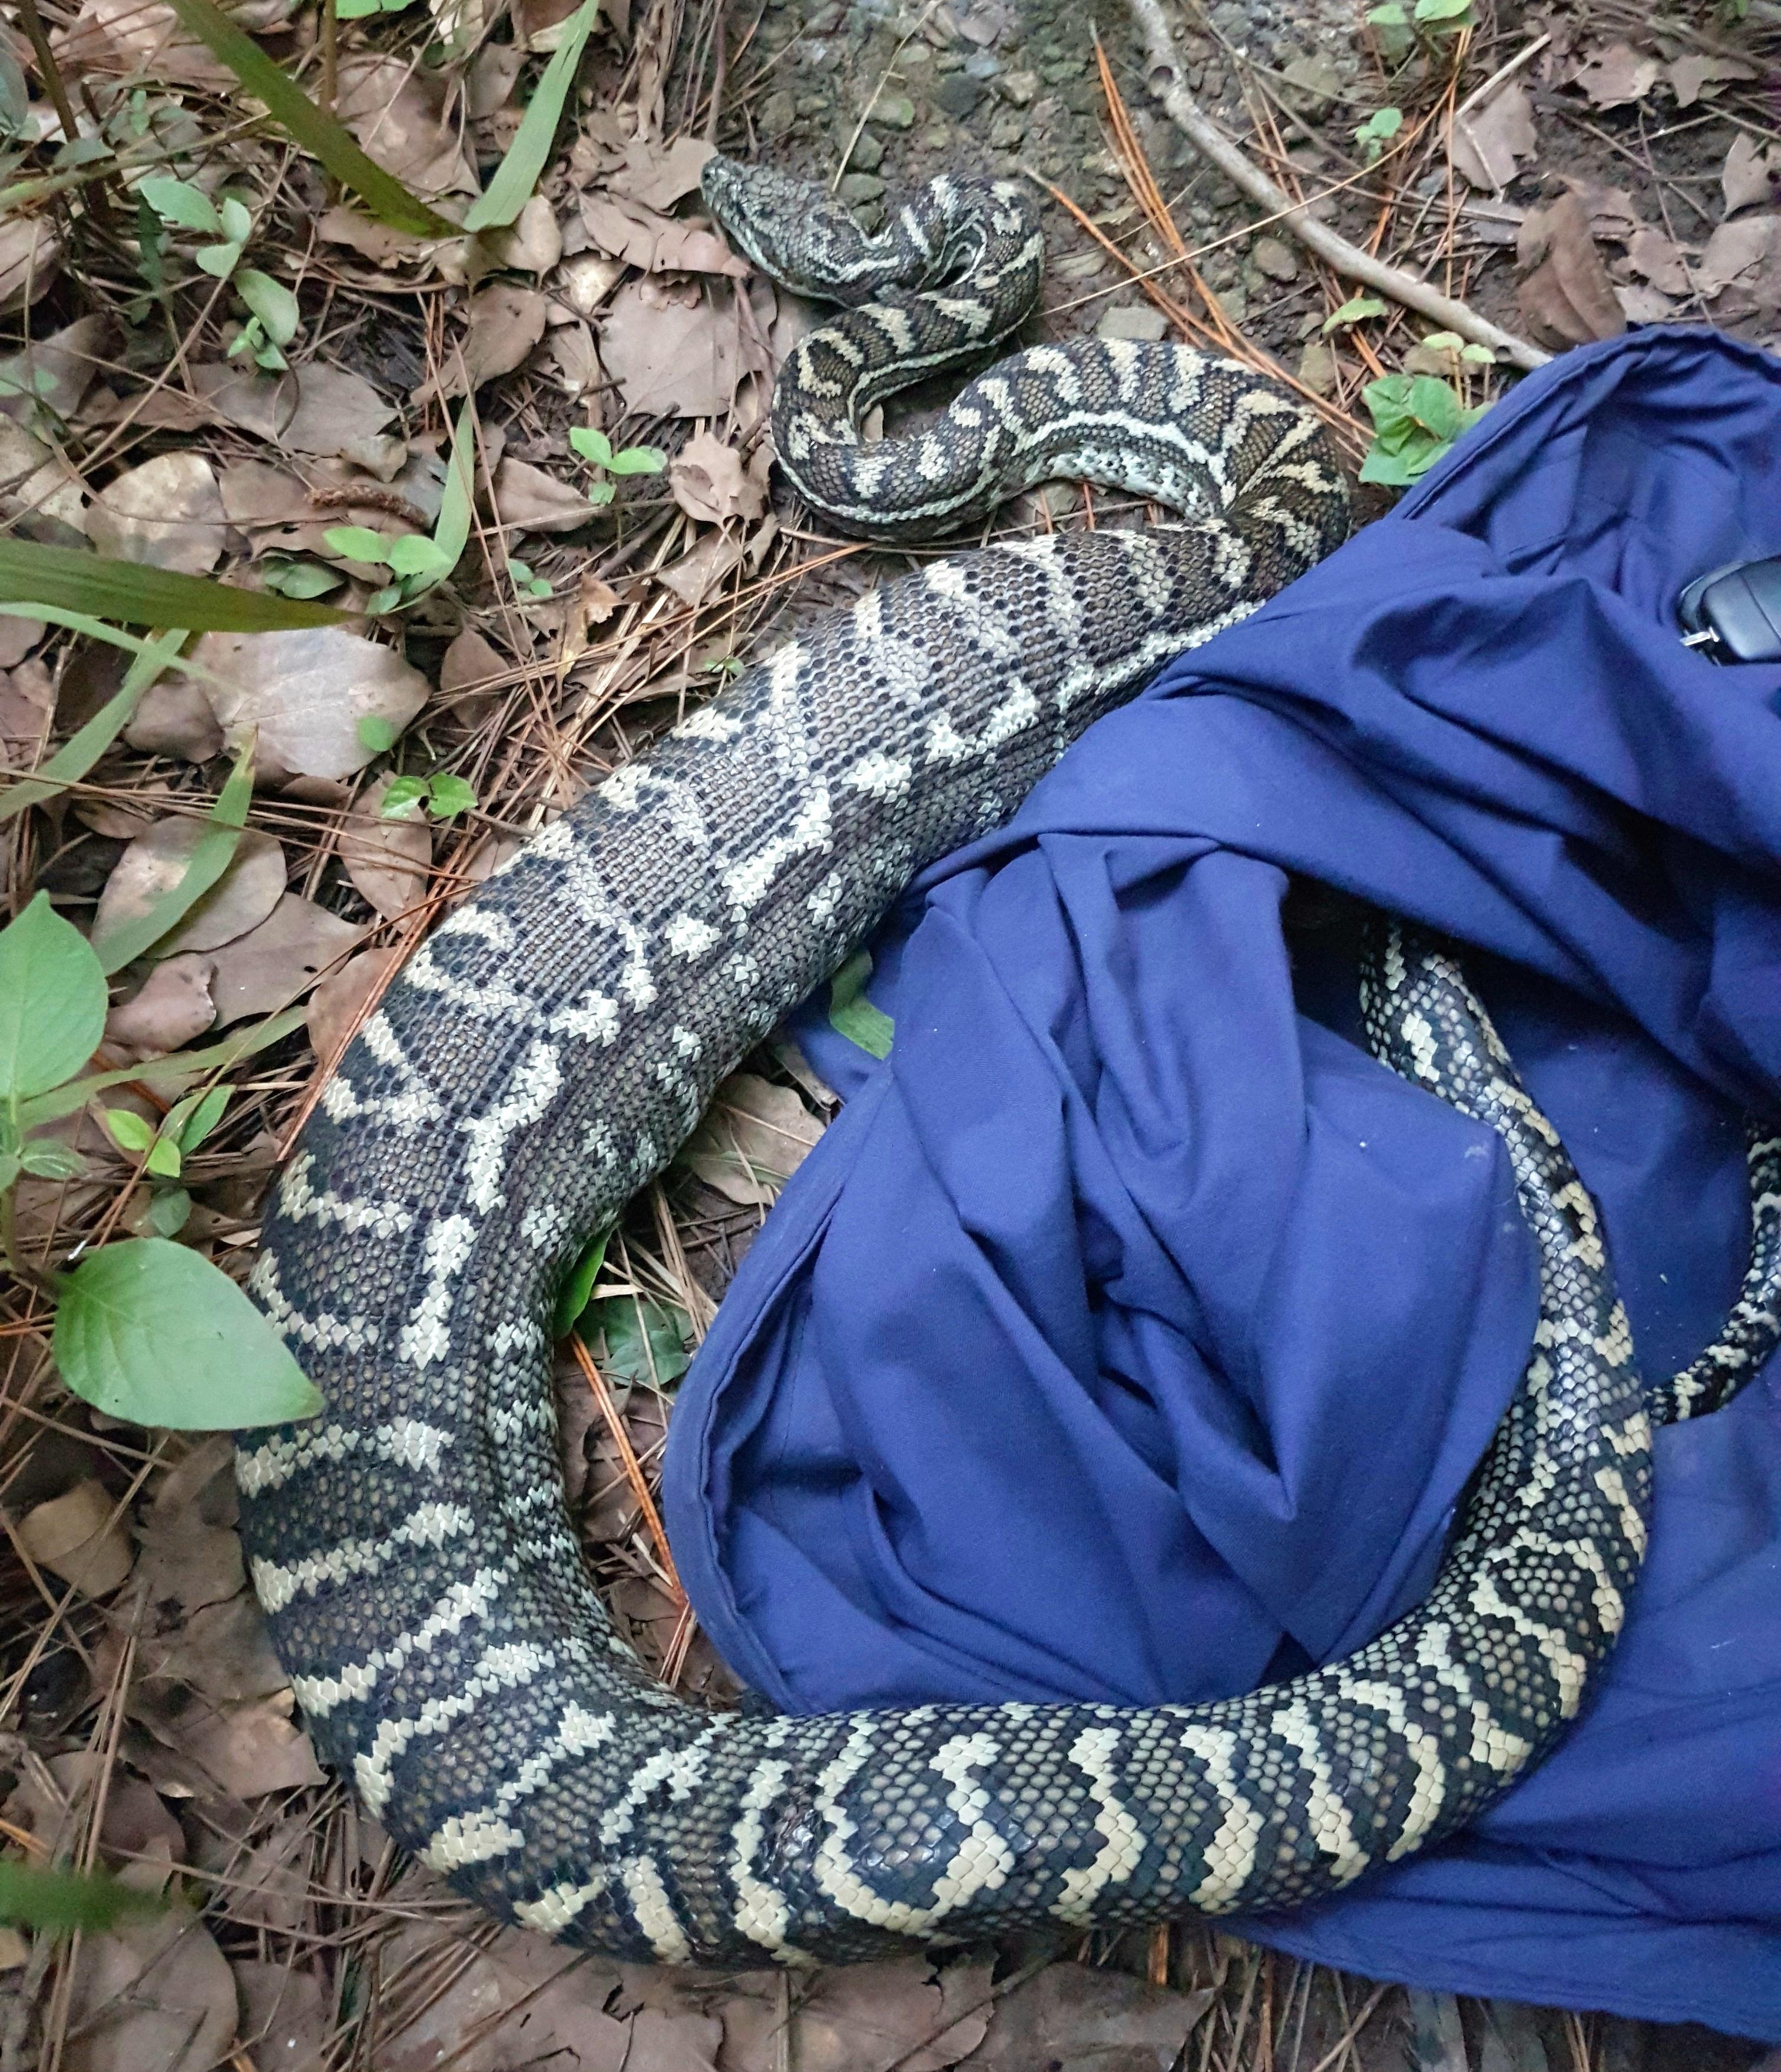 snake sliding out of blue bag